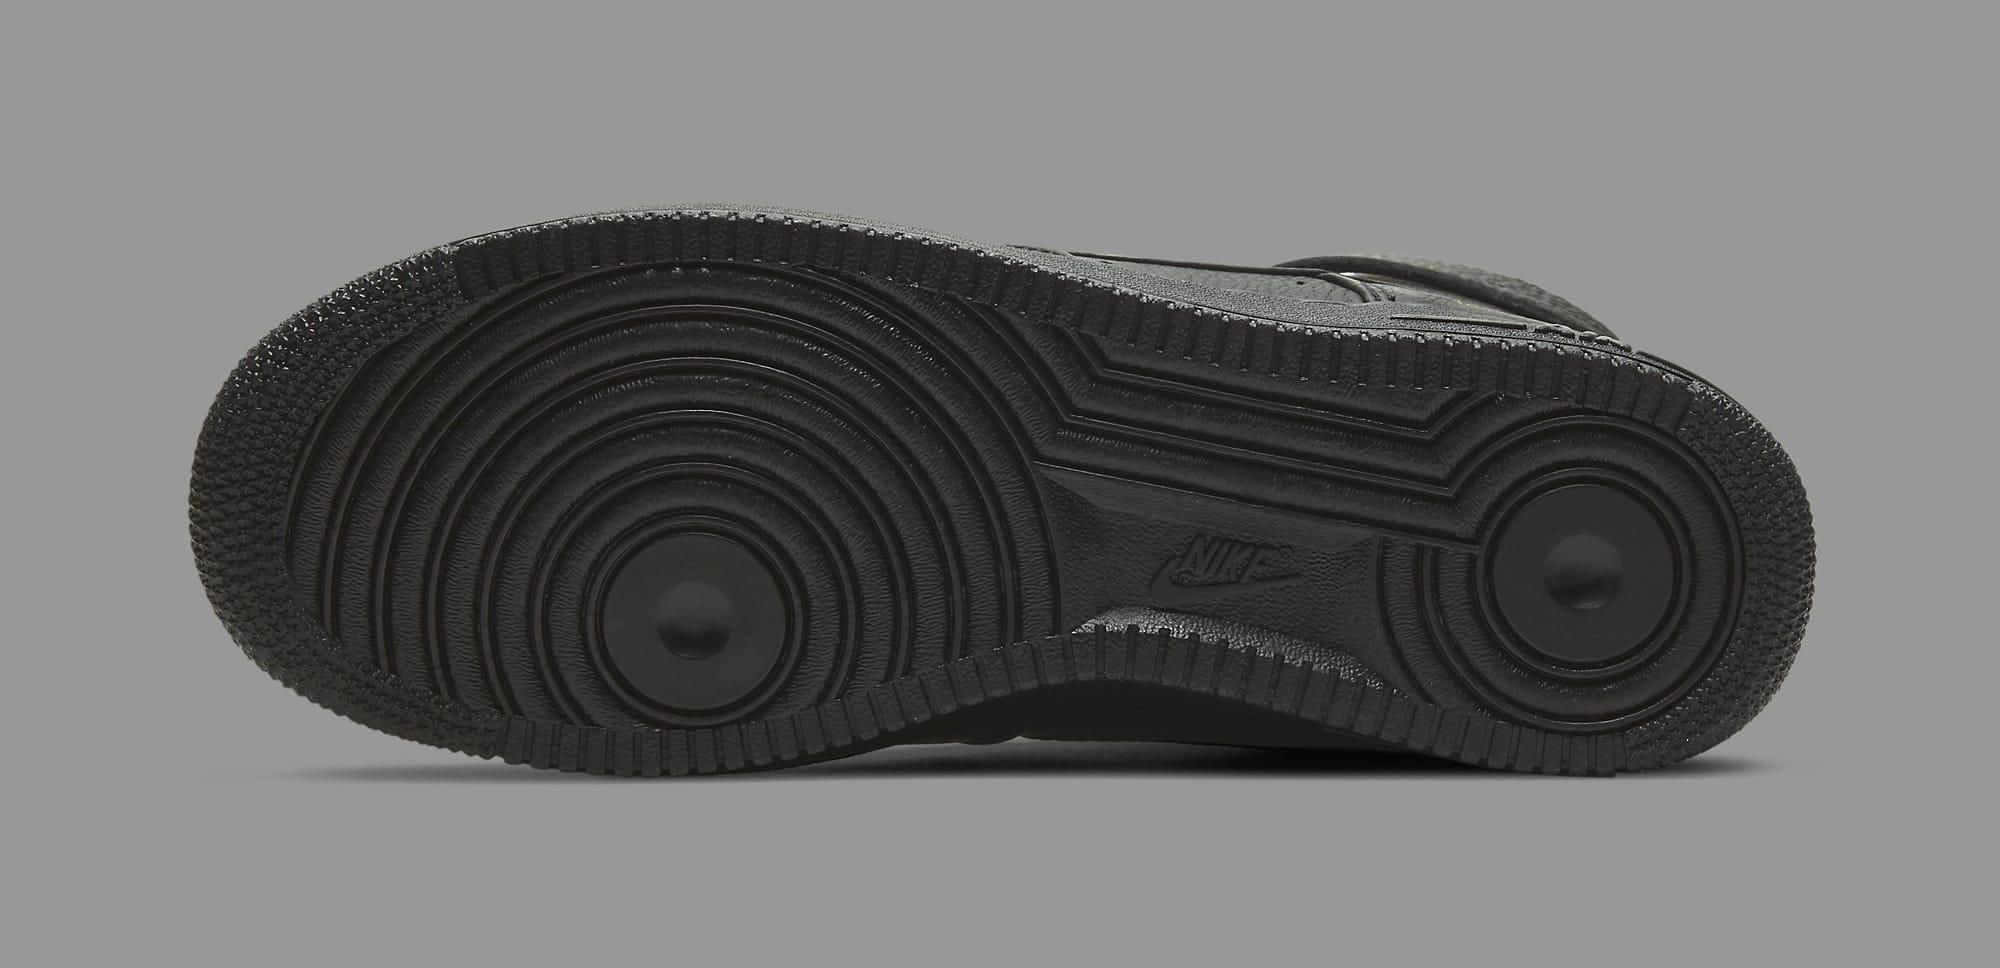 Alyx x Nike Air Force 1 High CQ4018-001 Outsole